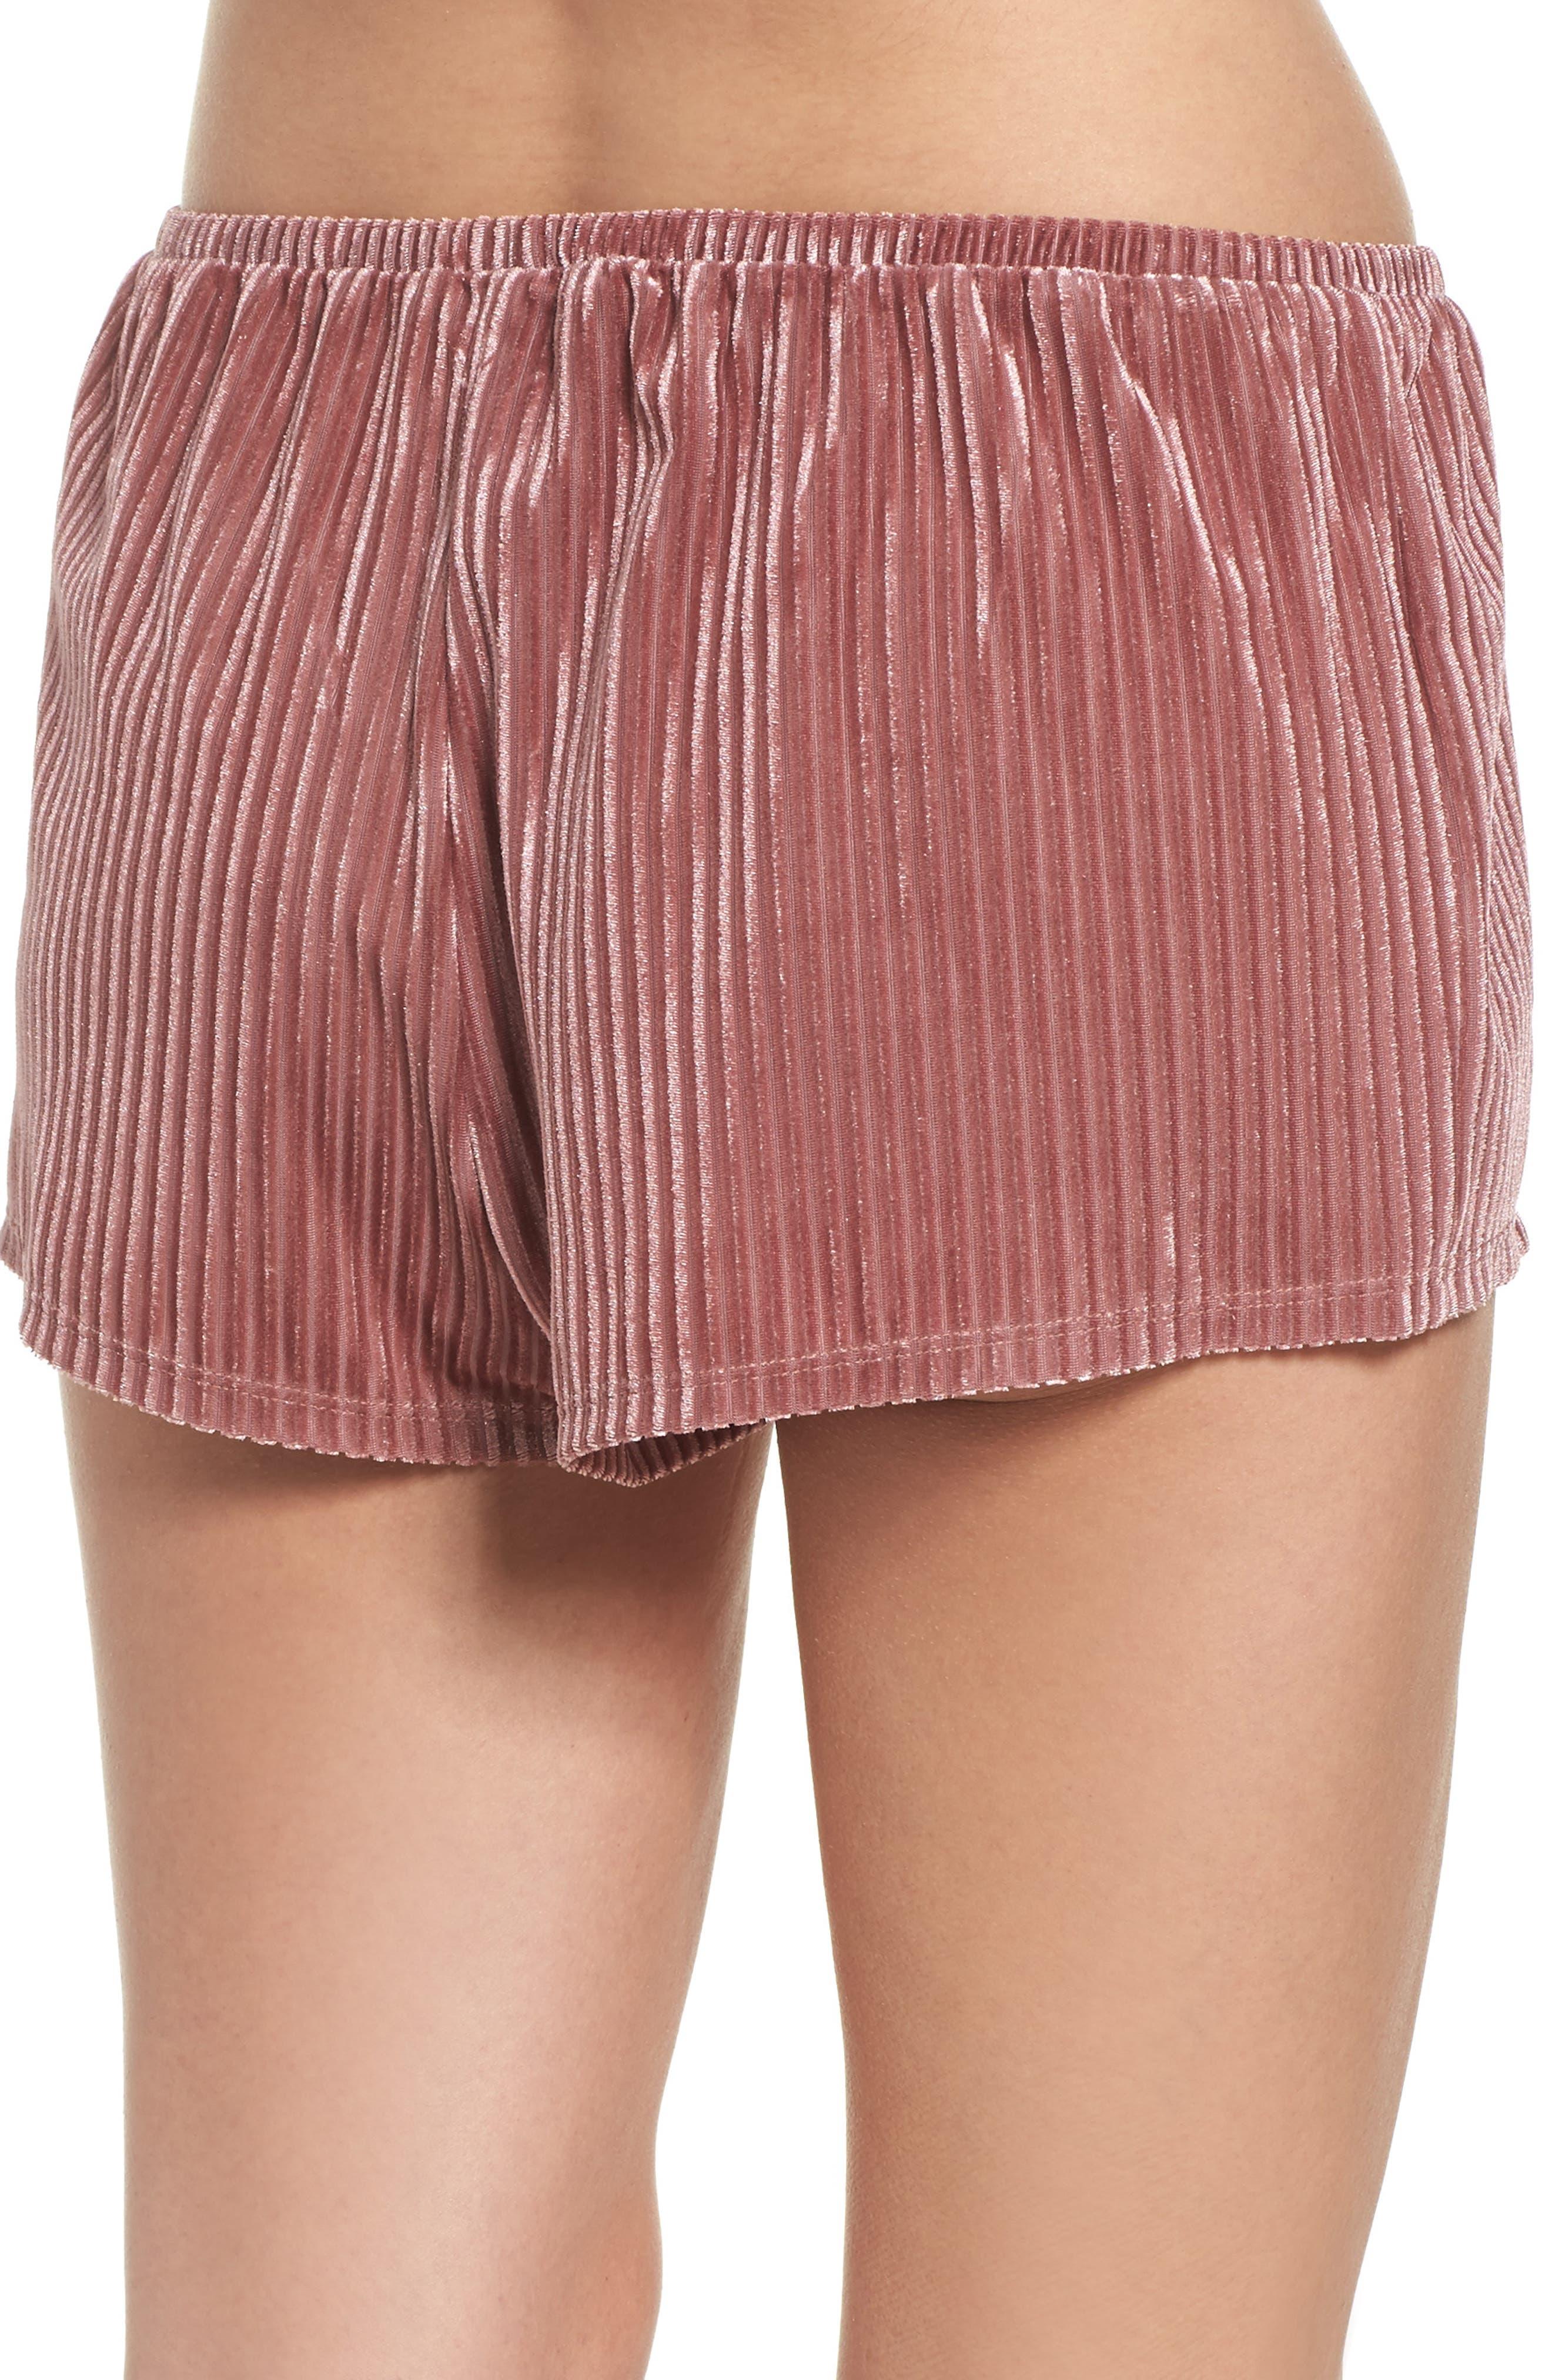 Velvet Pajama Shorts,                             Alternate thumbnail 4, color,